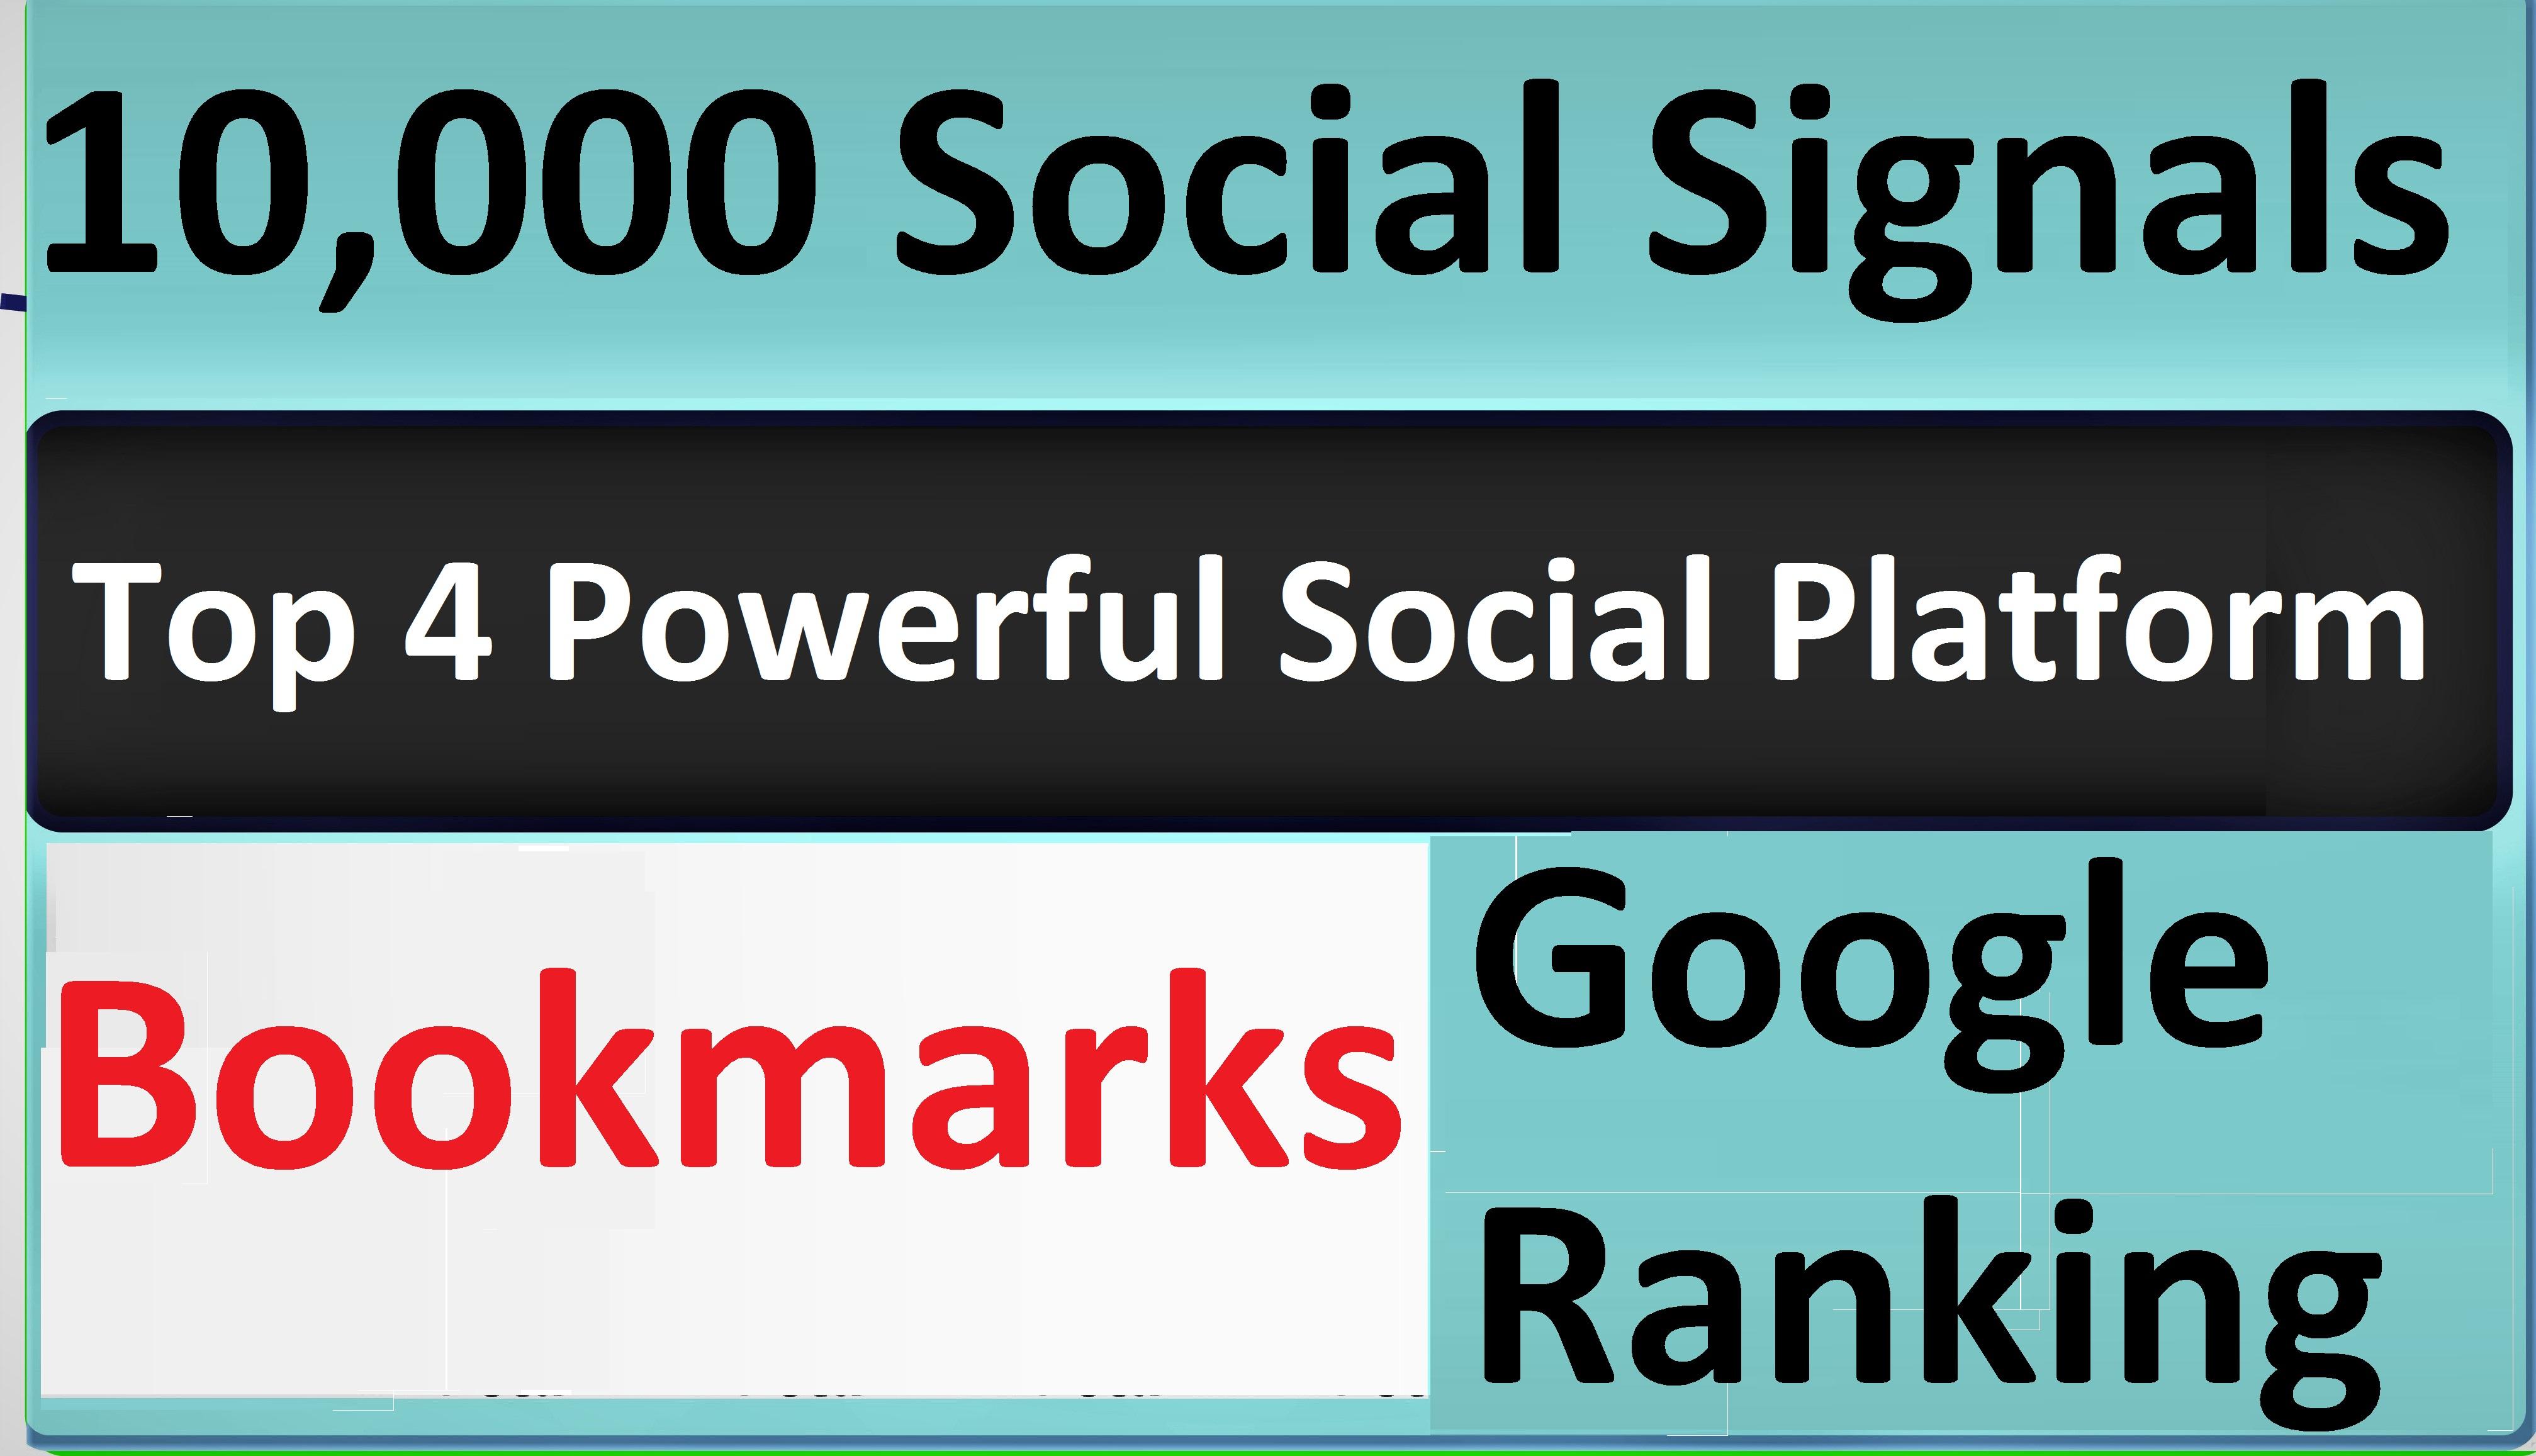 Give Top 4 Powerful Social Platform 10,000 PR9 SEO Social Signals Share Bookmarks Important Google